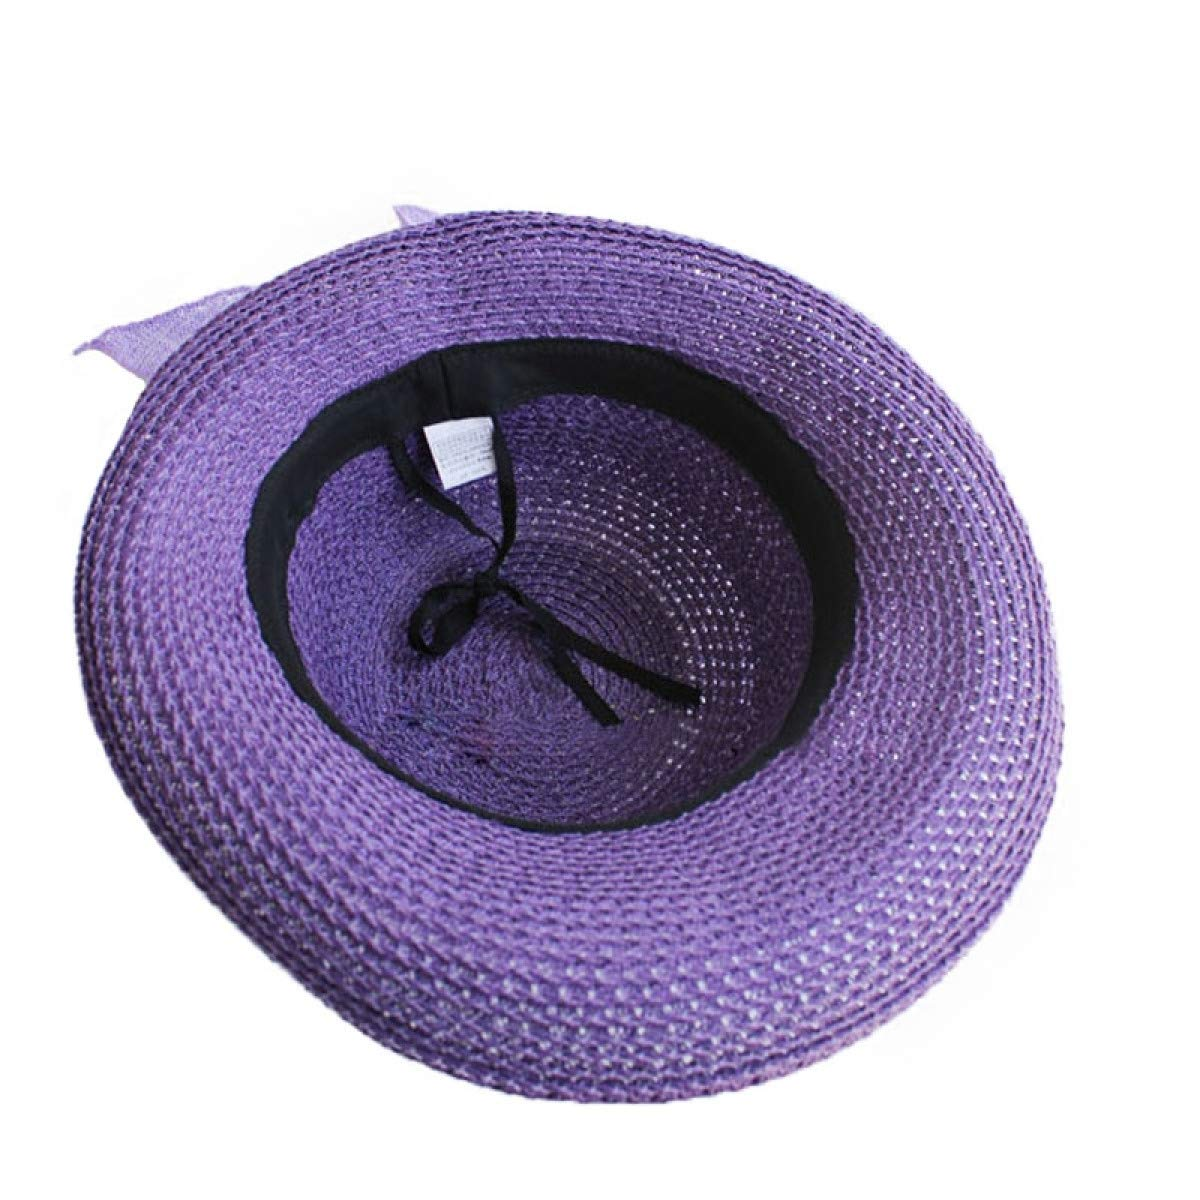 ddbe0e58b5c8a Amazon.com  WEEKEND SHOP FS Summer Sun Hats for Women Foldable 2018 Straw  Sunbonnet Wide Brim Floppy Cloche Hat Vacation Beach Style Paille Femme  Purple  ...